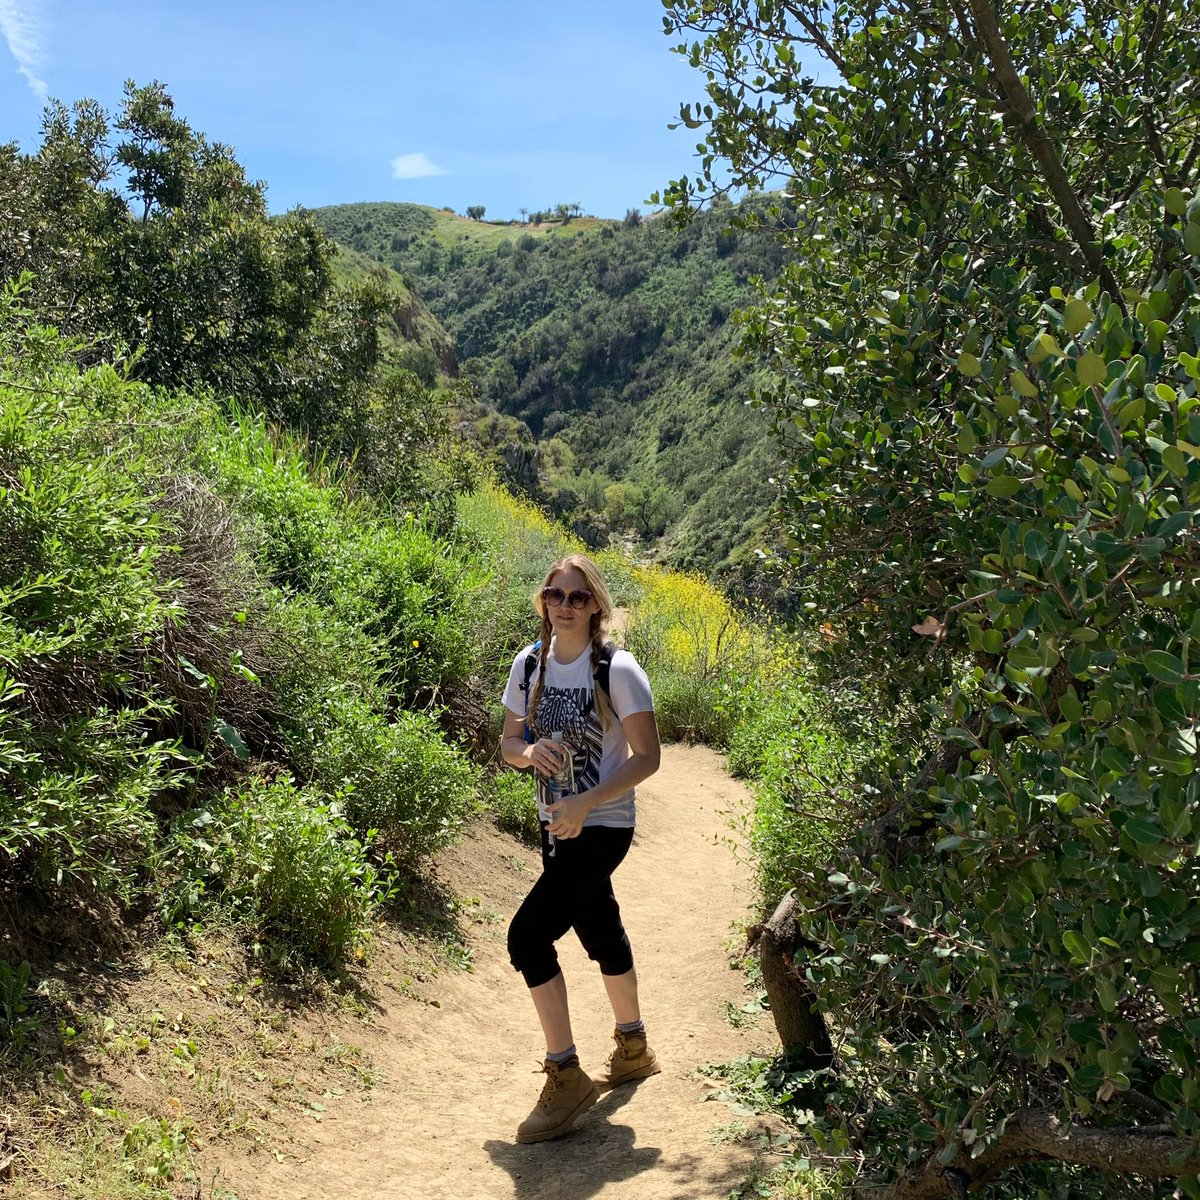 I'm off to see the wizard. 🧙♂️ #explore #maloriesadventures #nature #hiking #hikingadventures #outdoors #adventure #adventurer #seetheworld